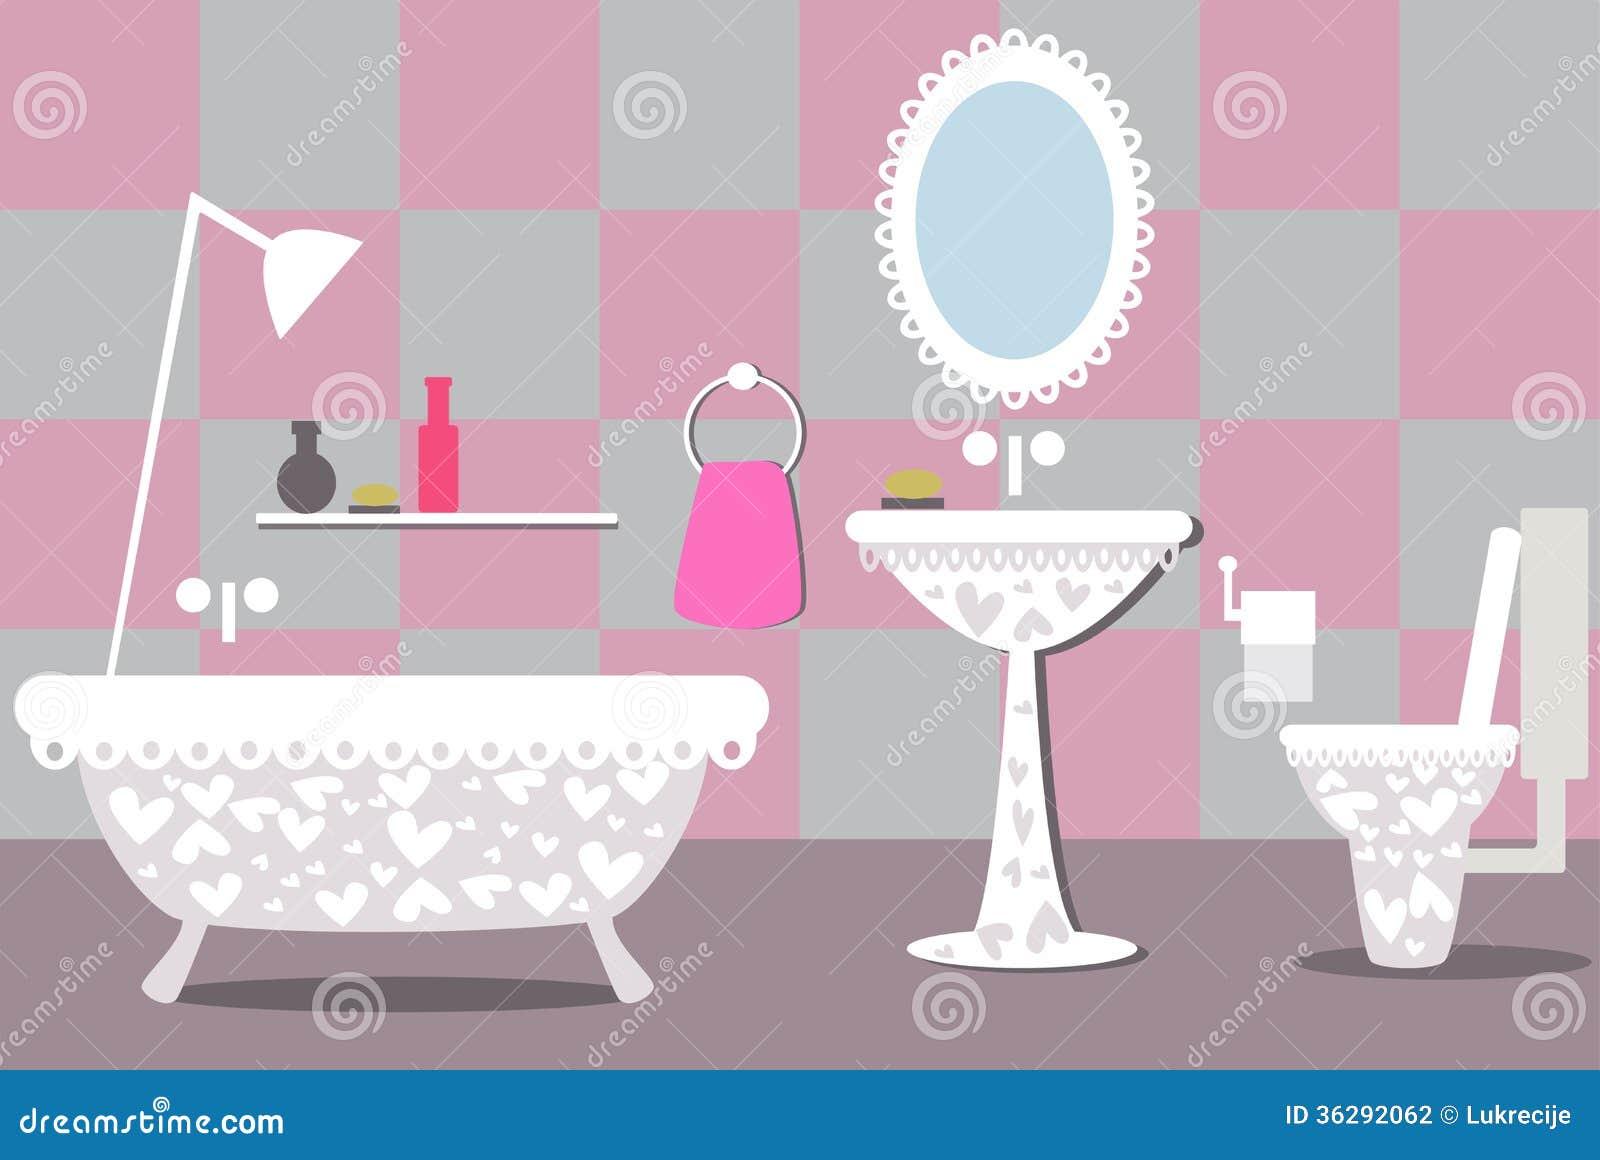 Illustration Of Bathroom Stock Photography Image 36292062